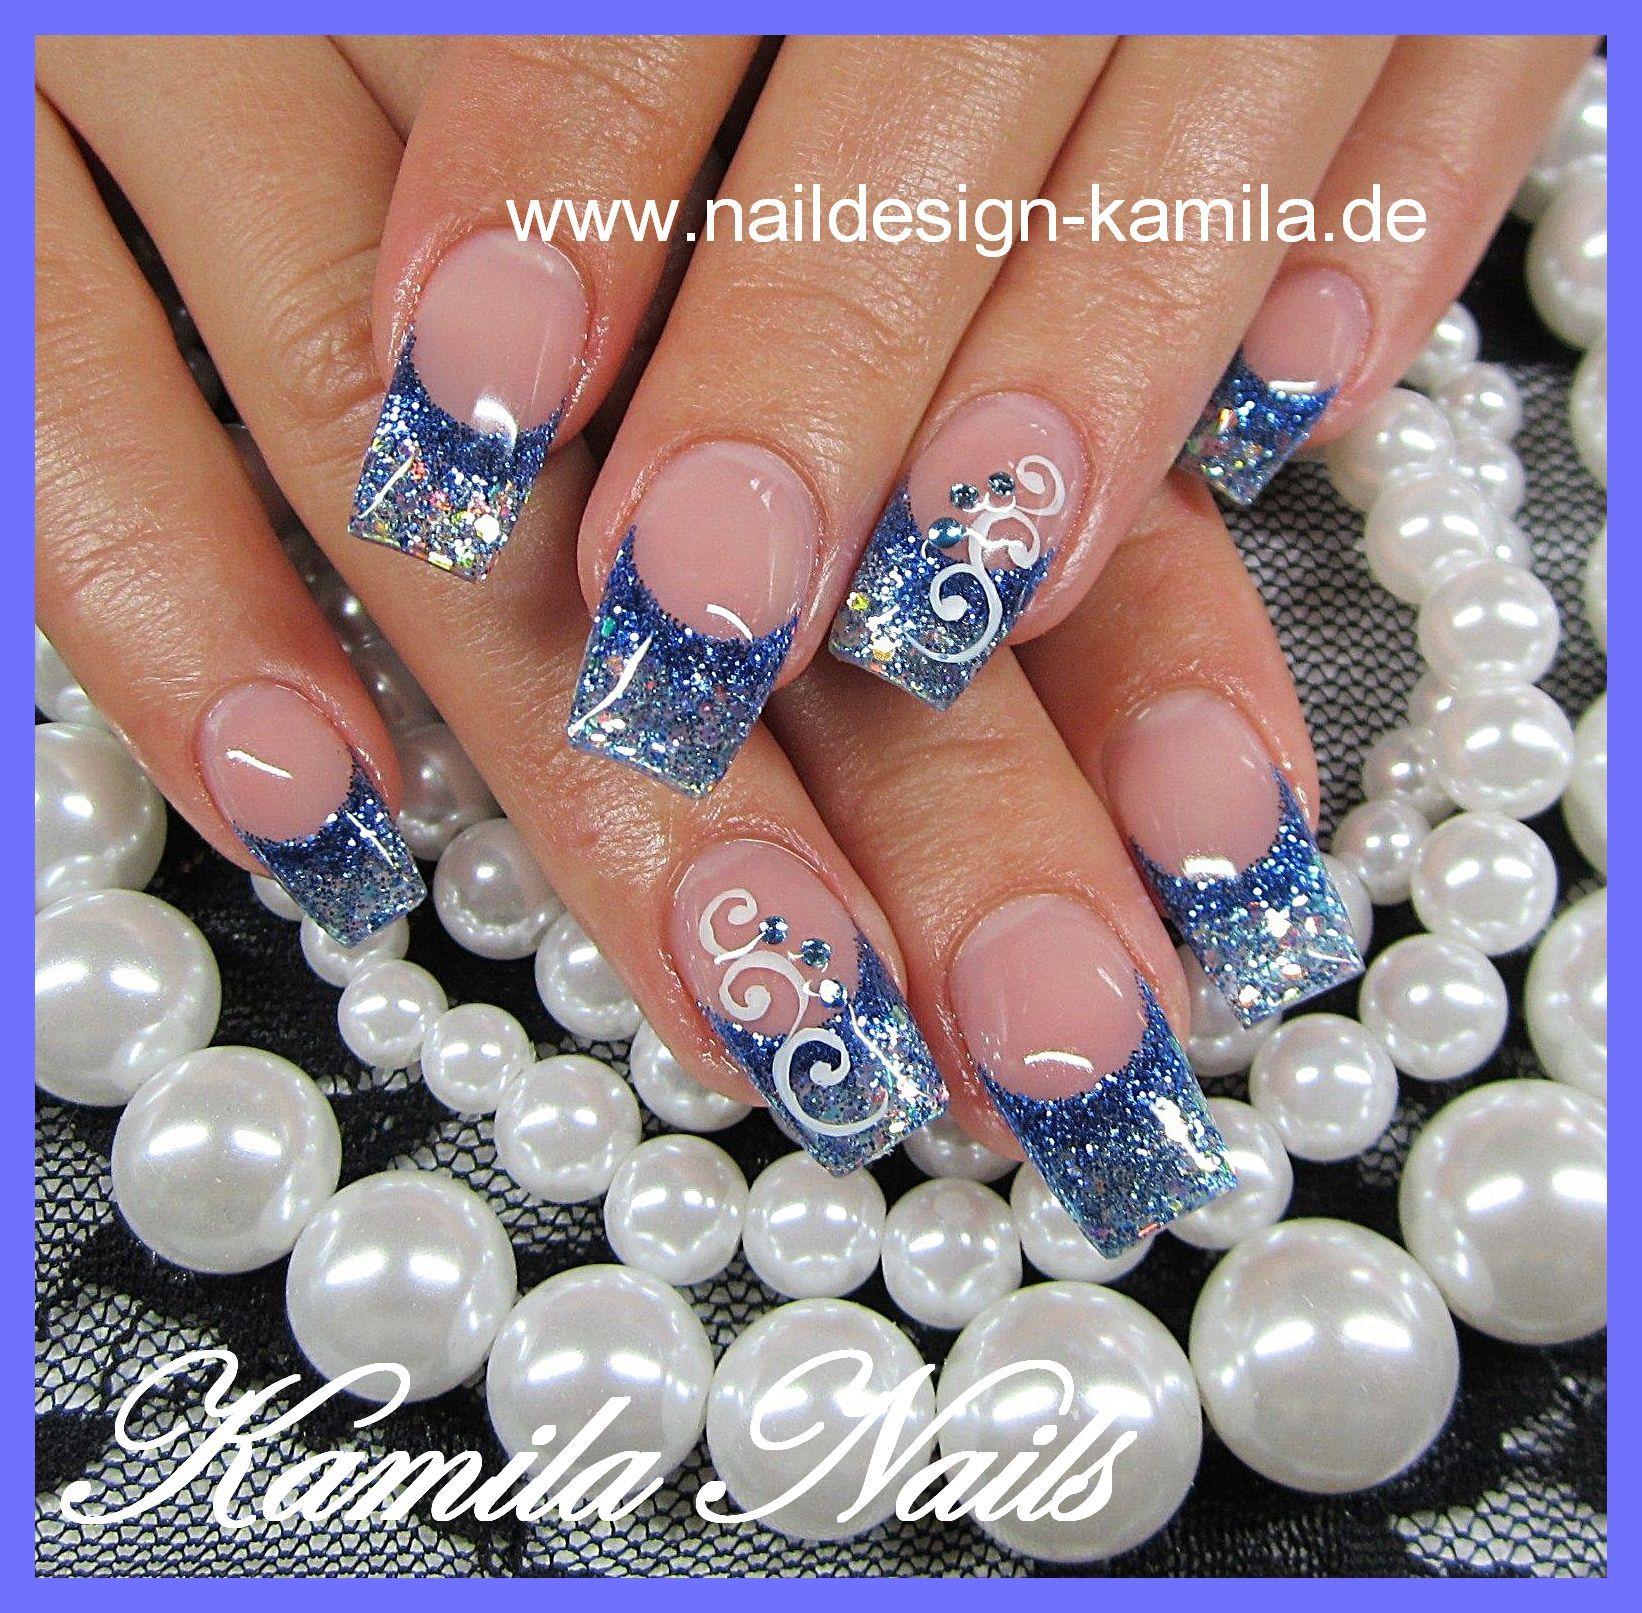 Awesome Fingernägel Design Bilder Gallery Of Nailart